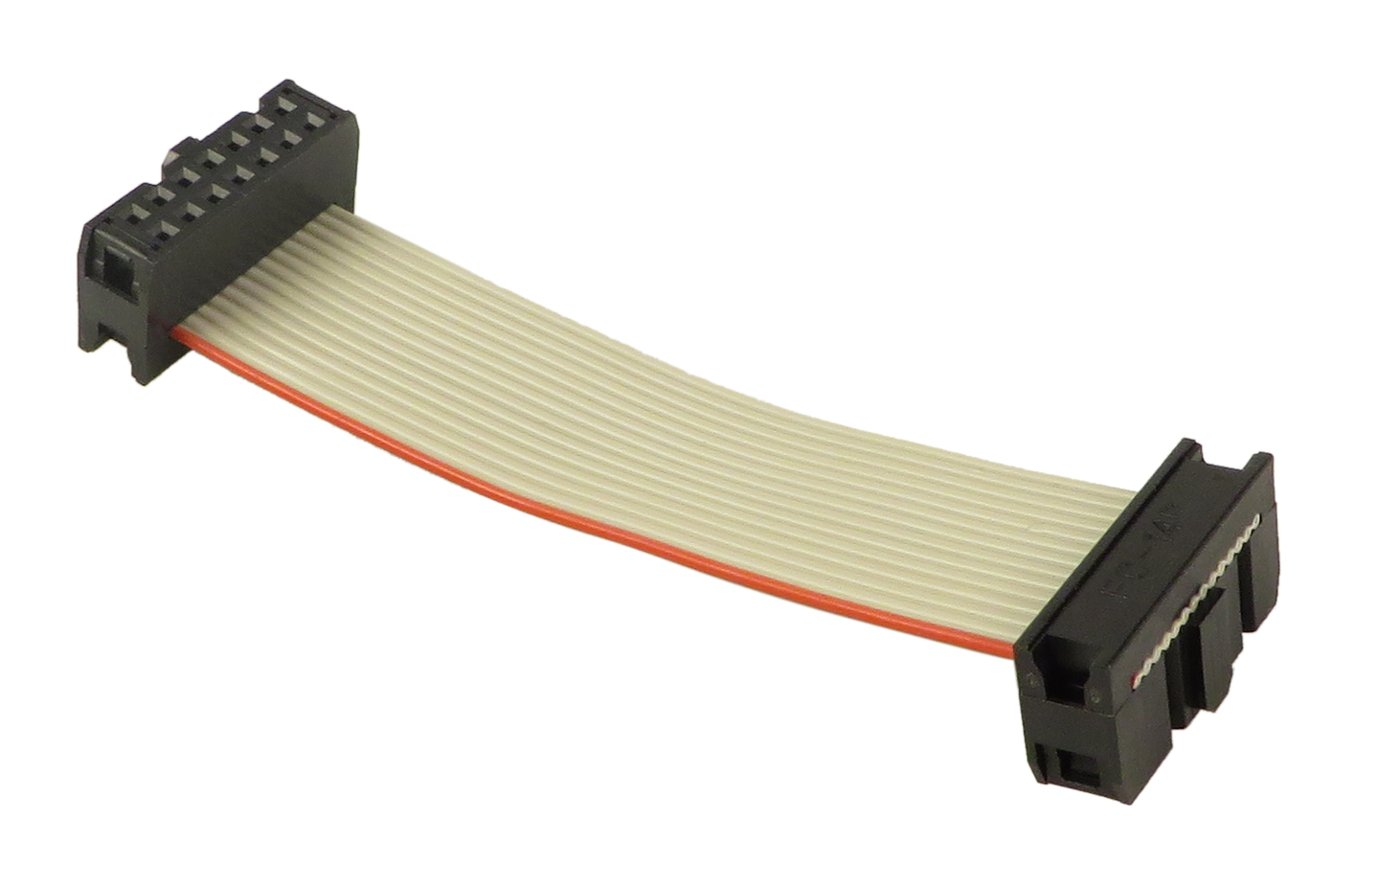 Flat DSP to PCB Cable for Numa Organ and Numa Organ 2